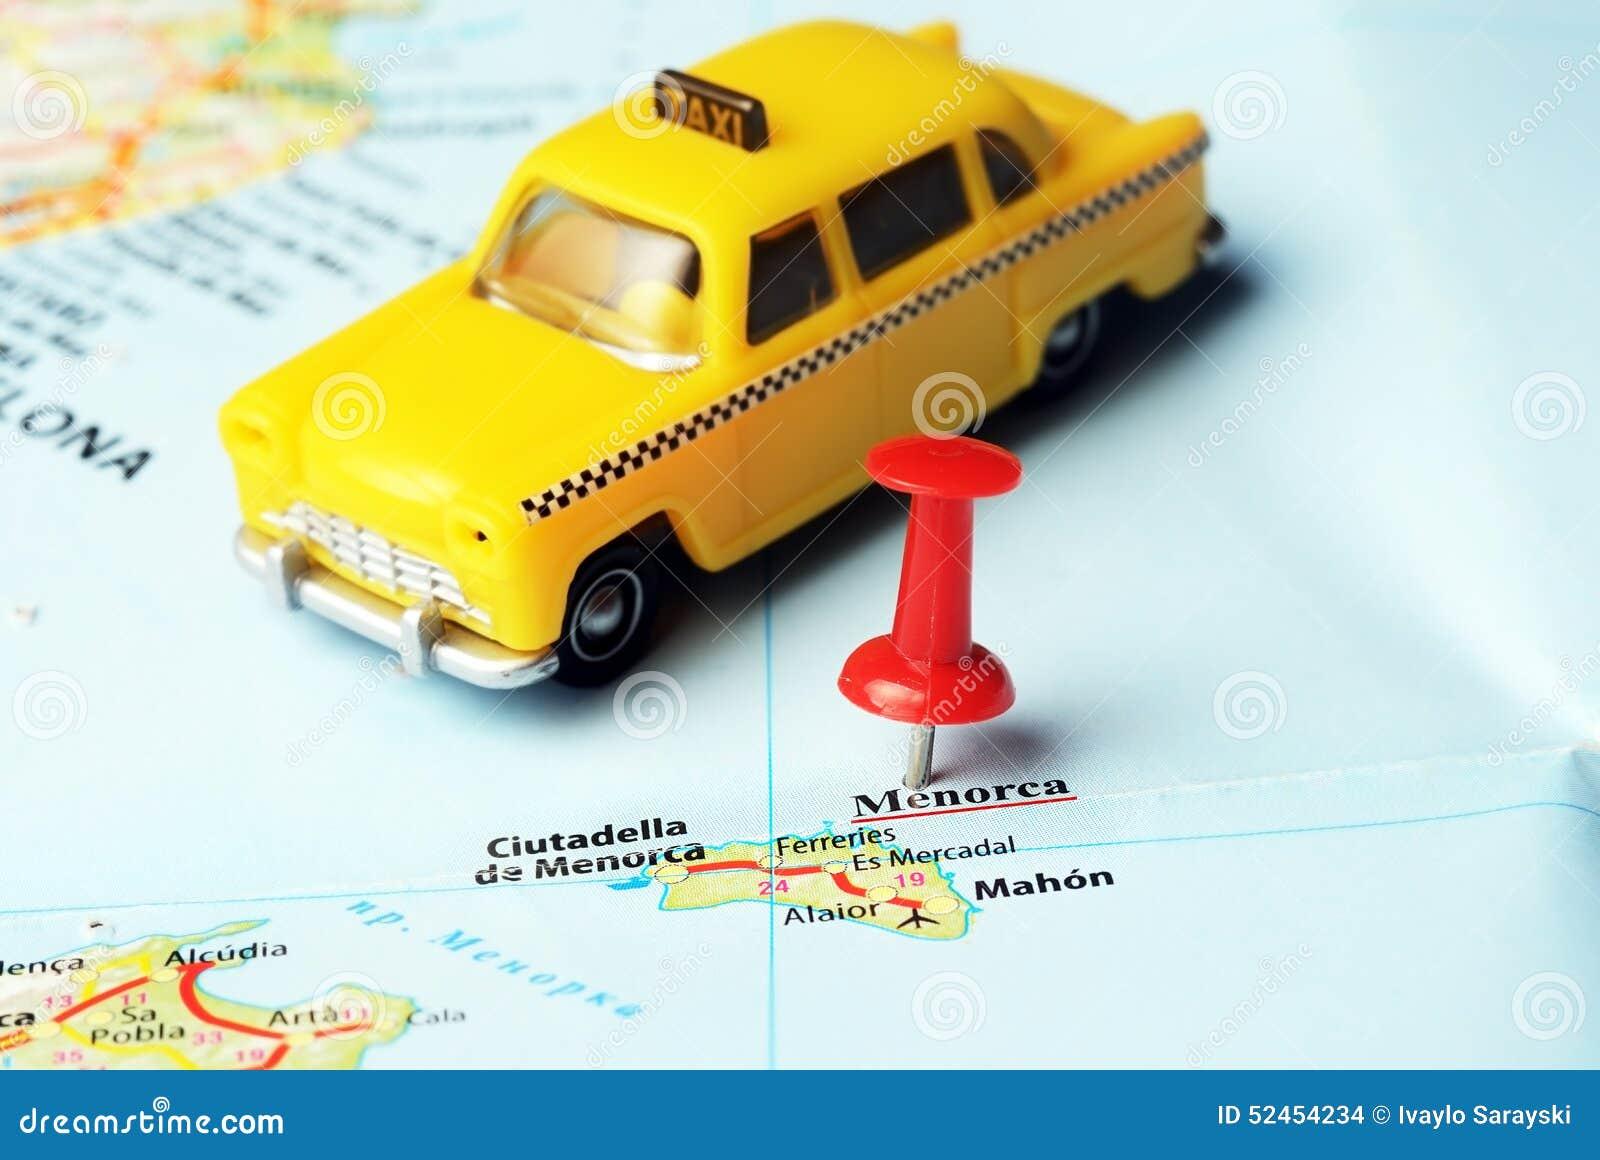 Insel Menorca Karte.Kartentaxi Menorca Insel Spanien Stockfoto Bild Von